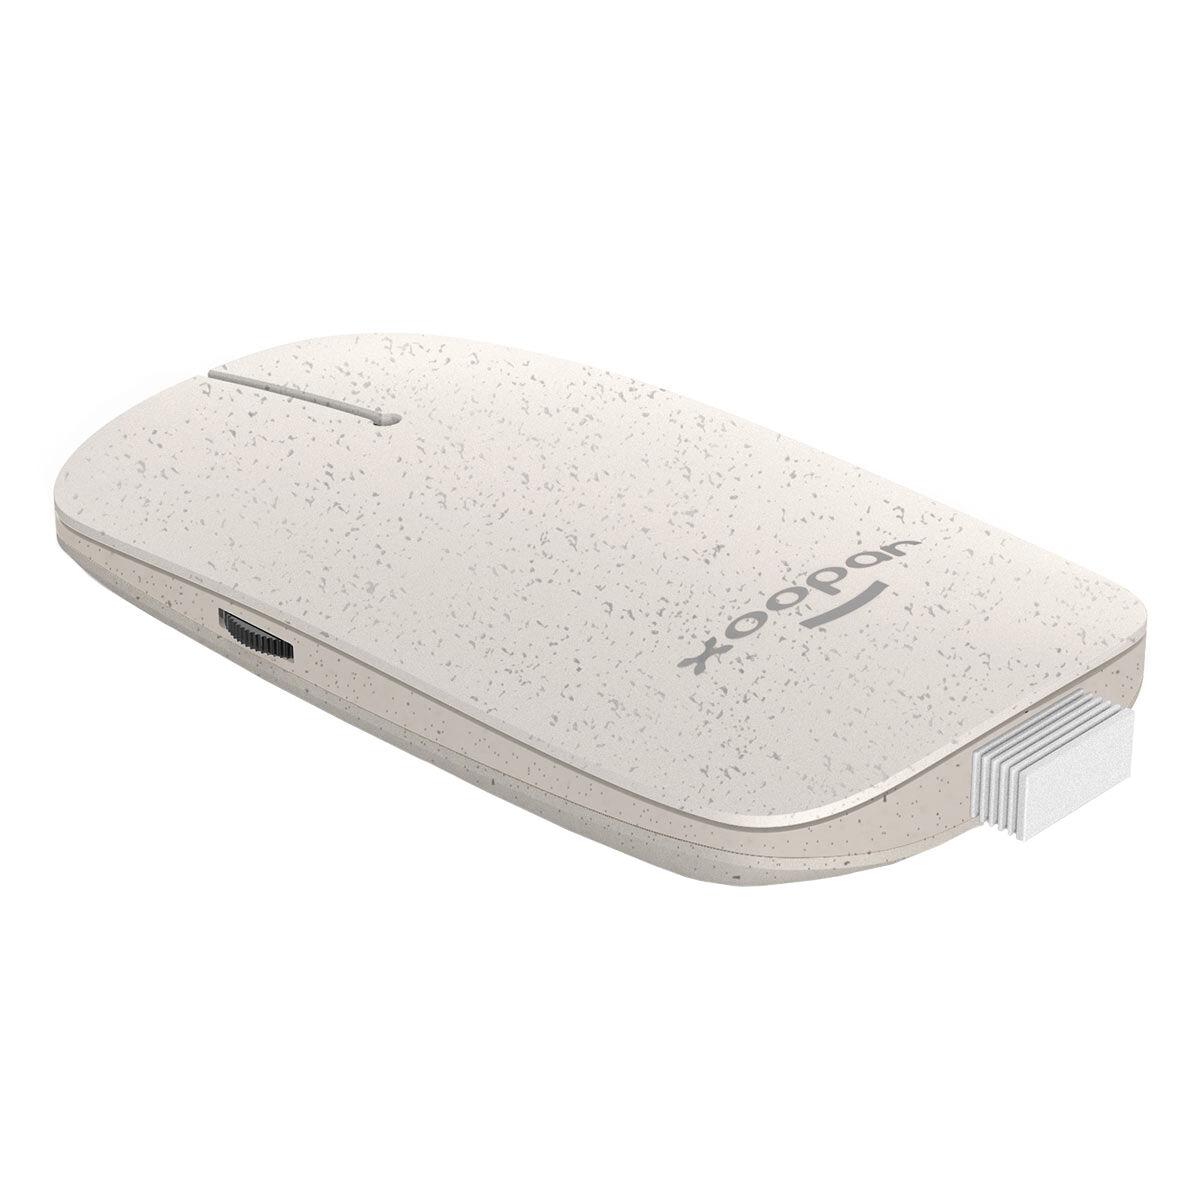 Xoopar Wireless Wheat Mouse